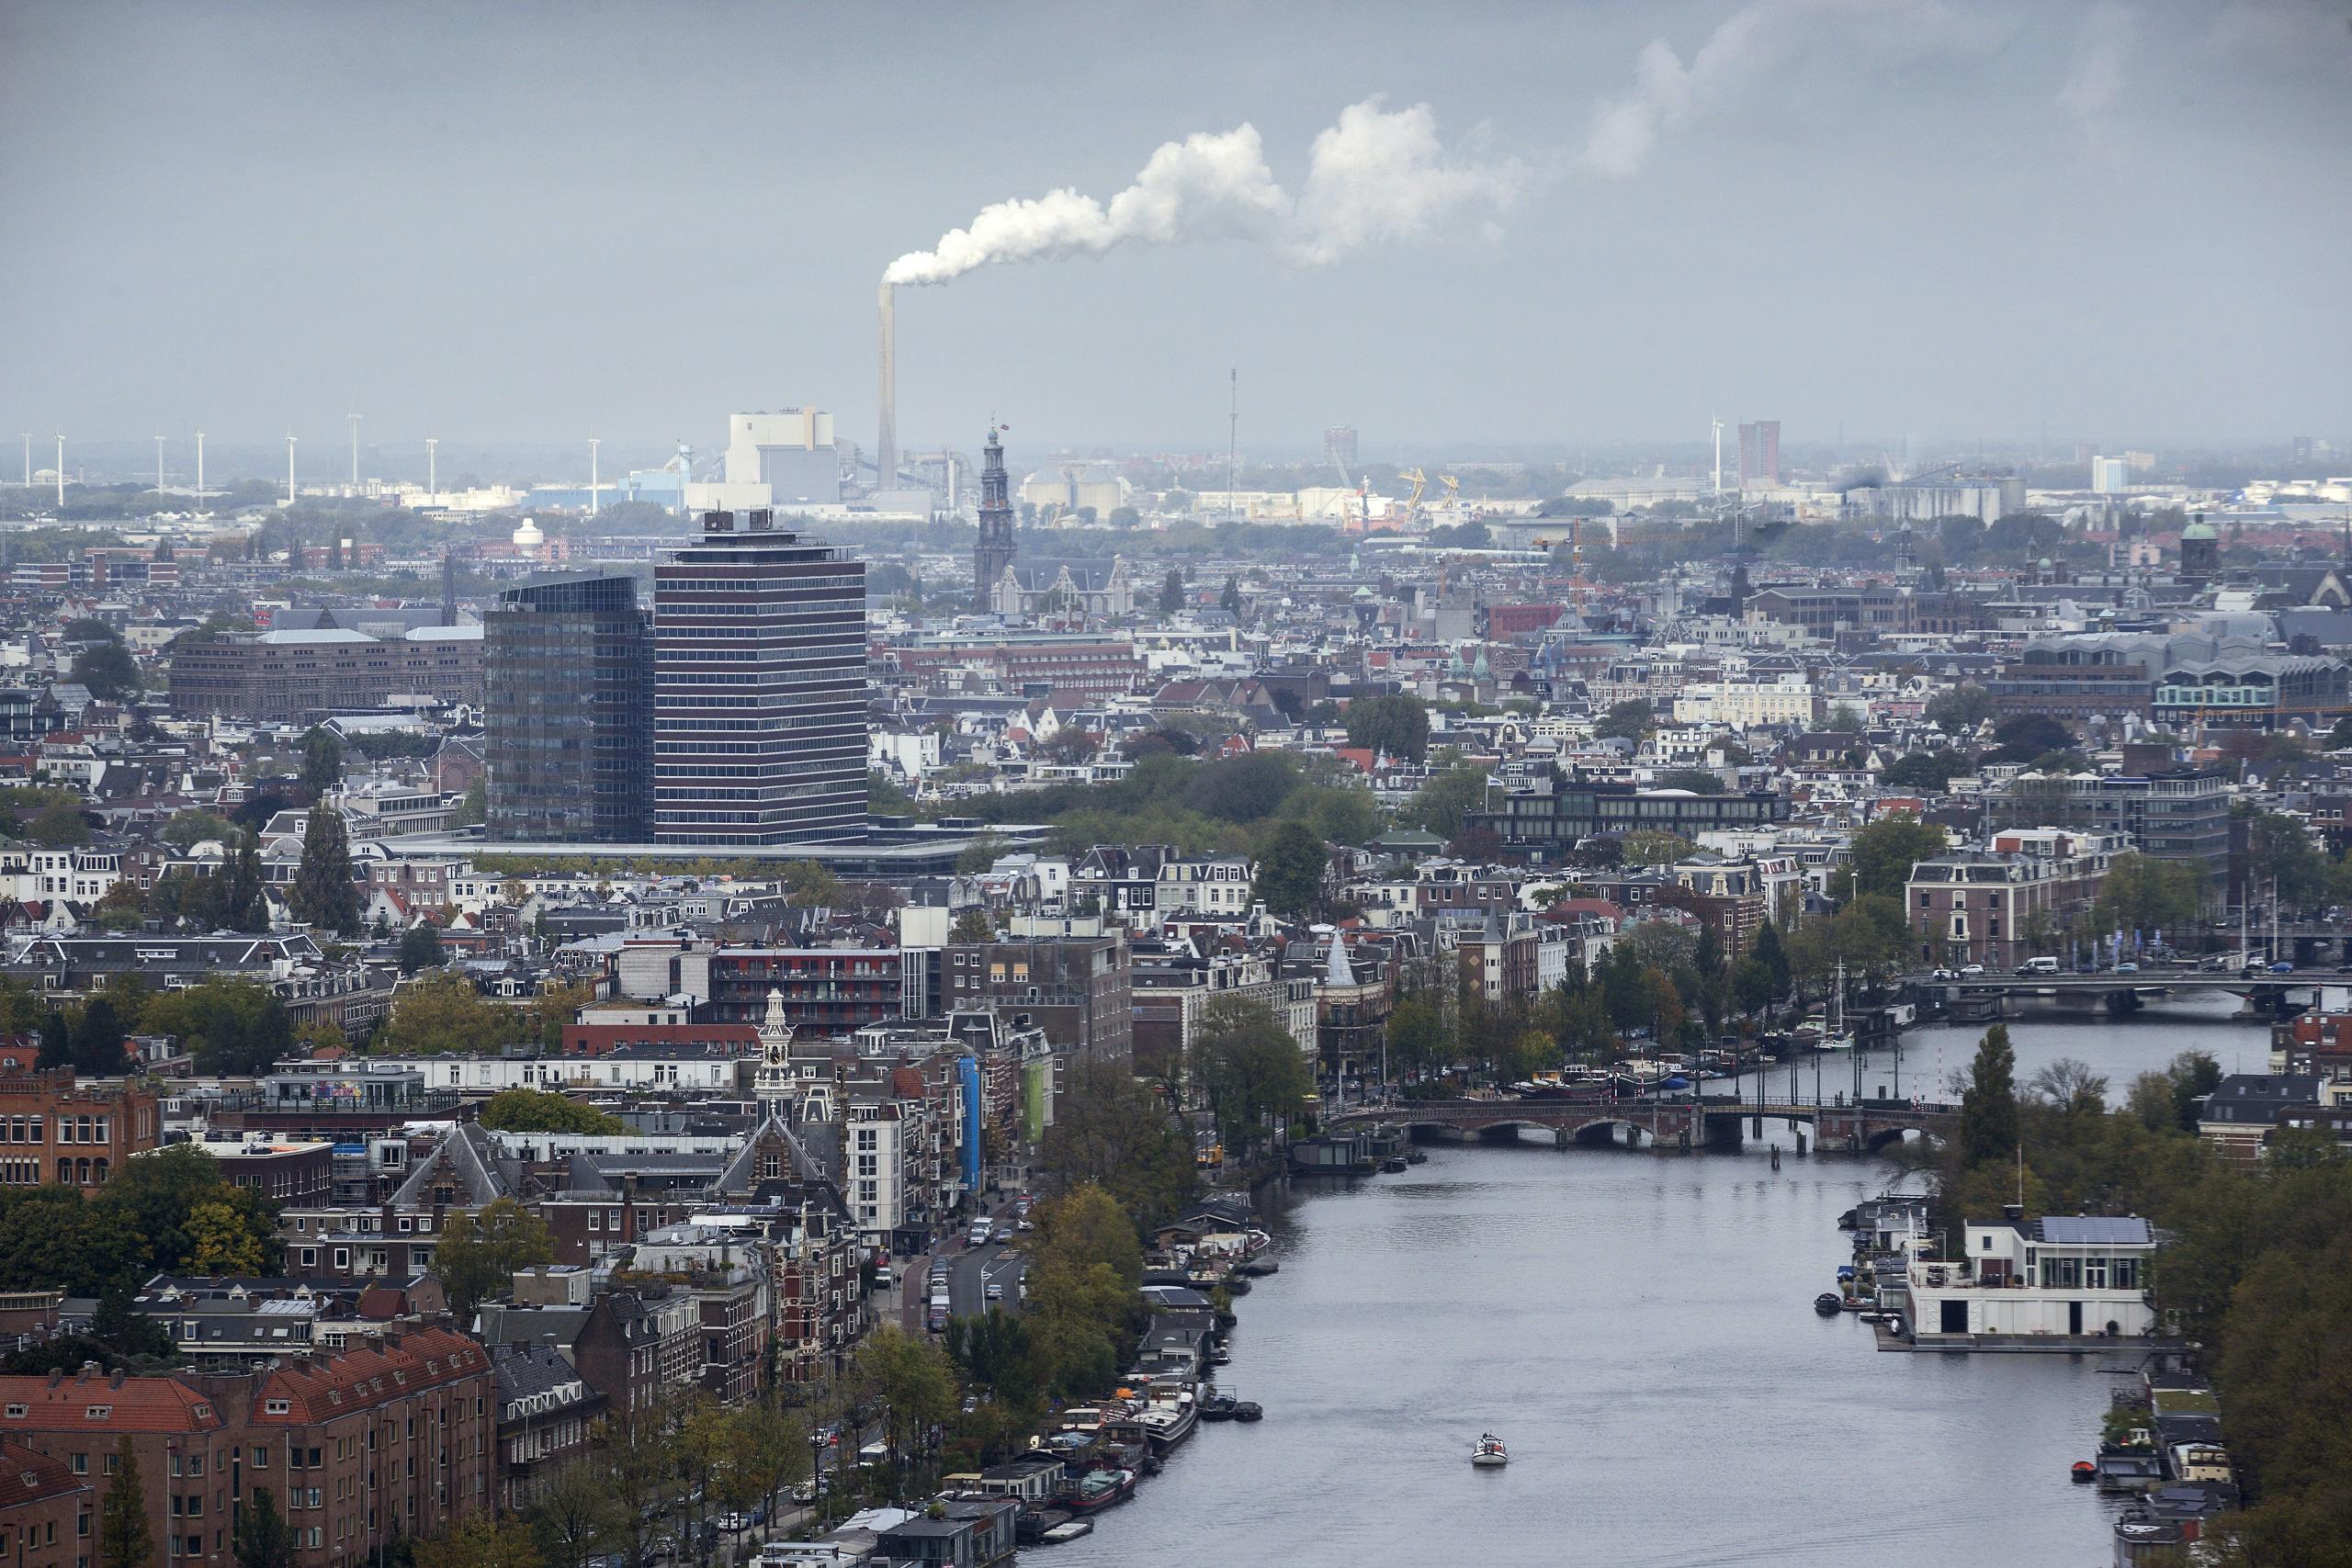 Nederland, Amsterdam, 10-10-2017. Uitzicht vanuit de Rembrandttoren in Amsterdam op Amsterdam.  Foto: Olivier Middendorp